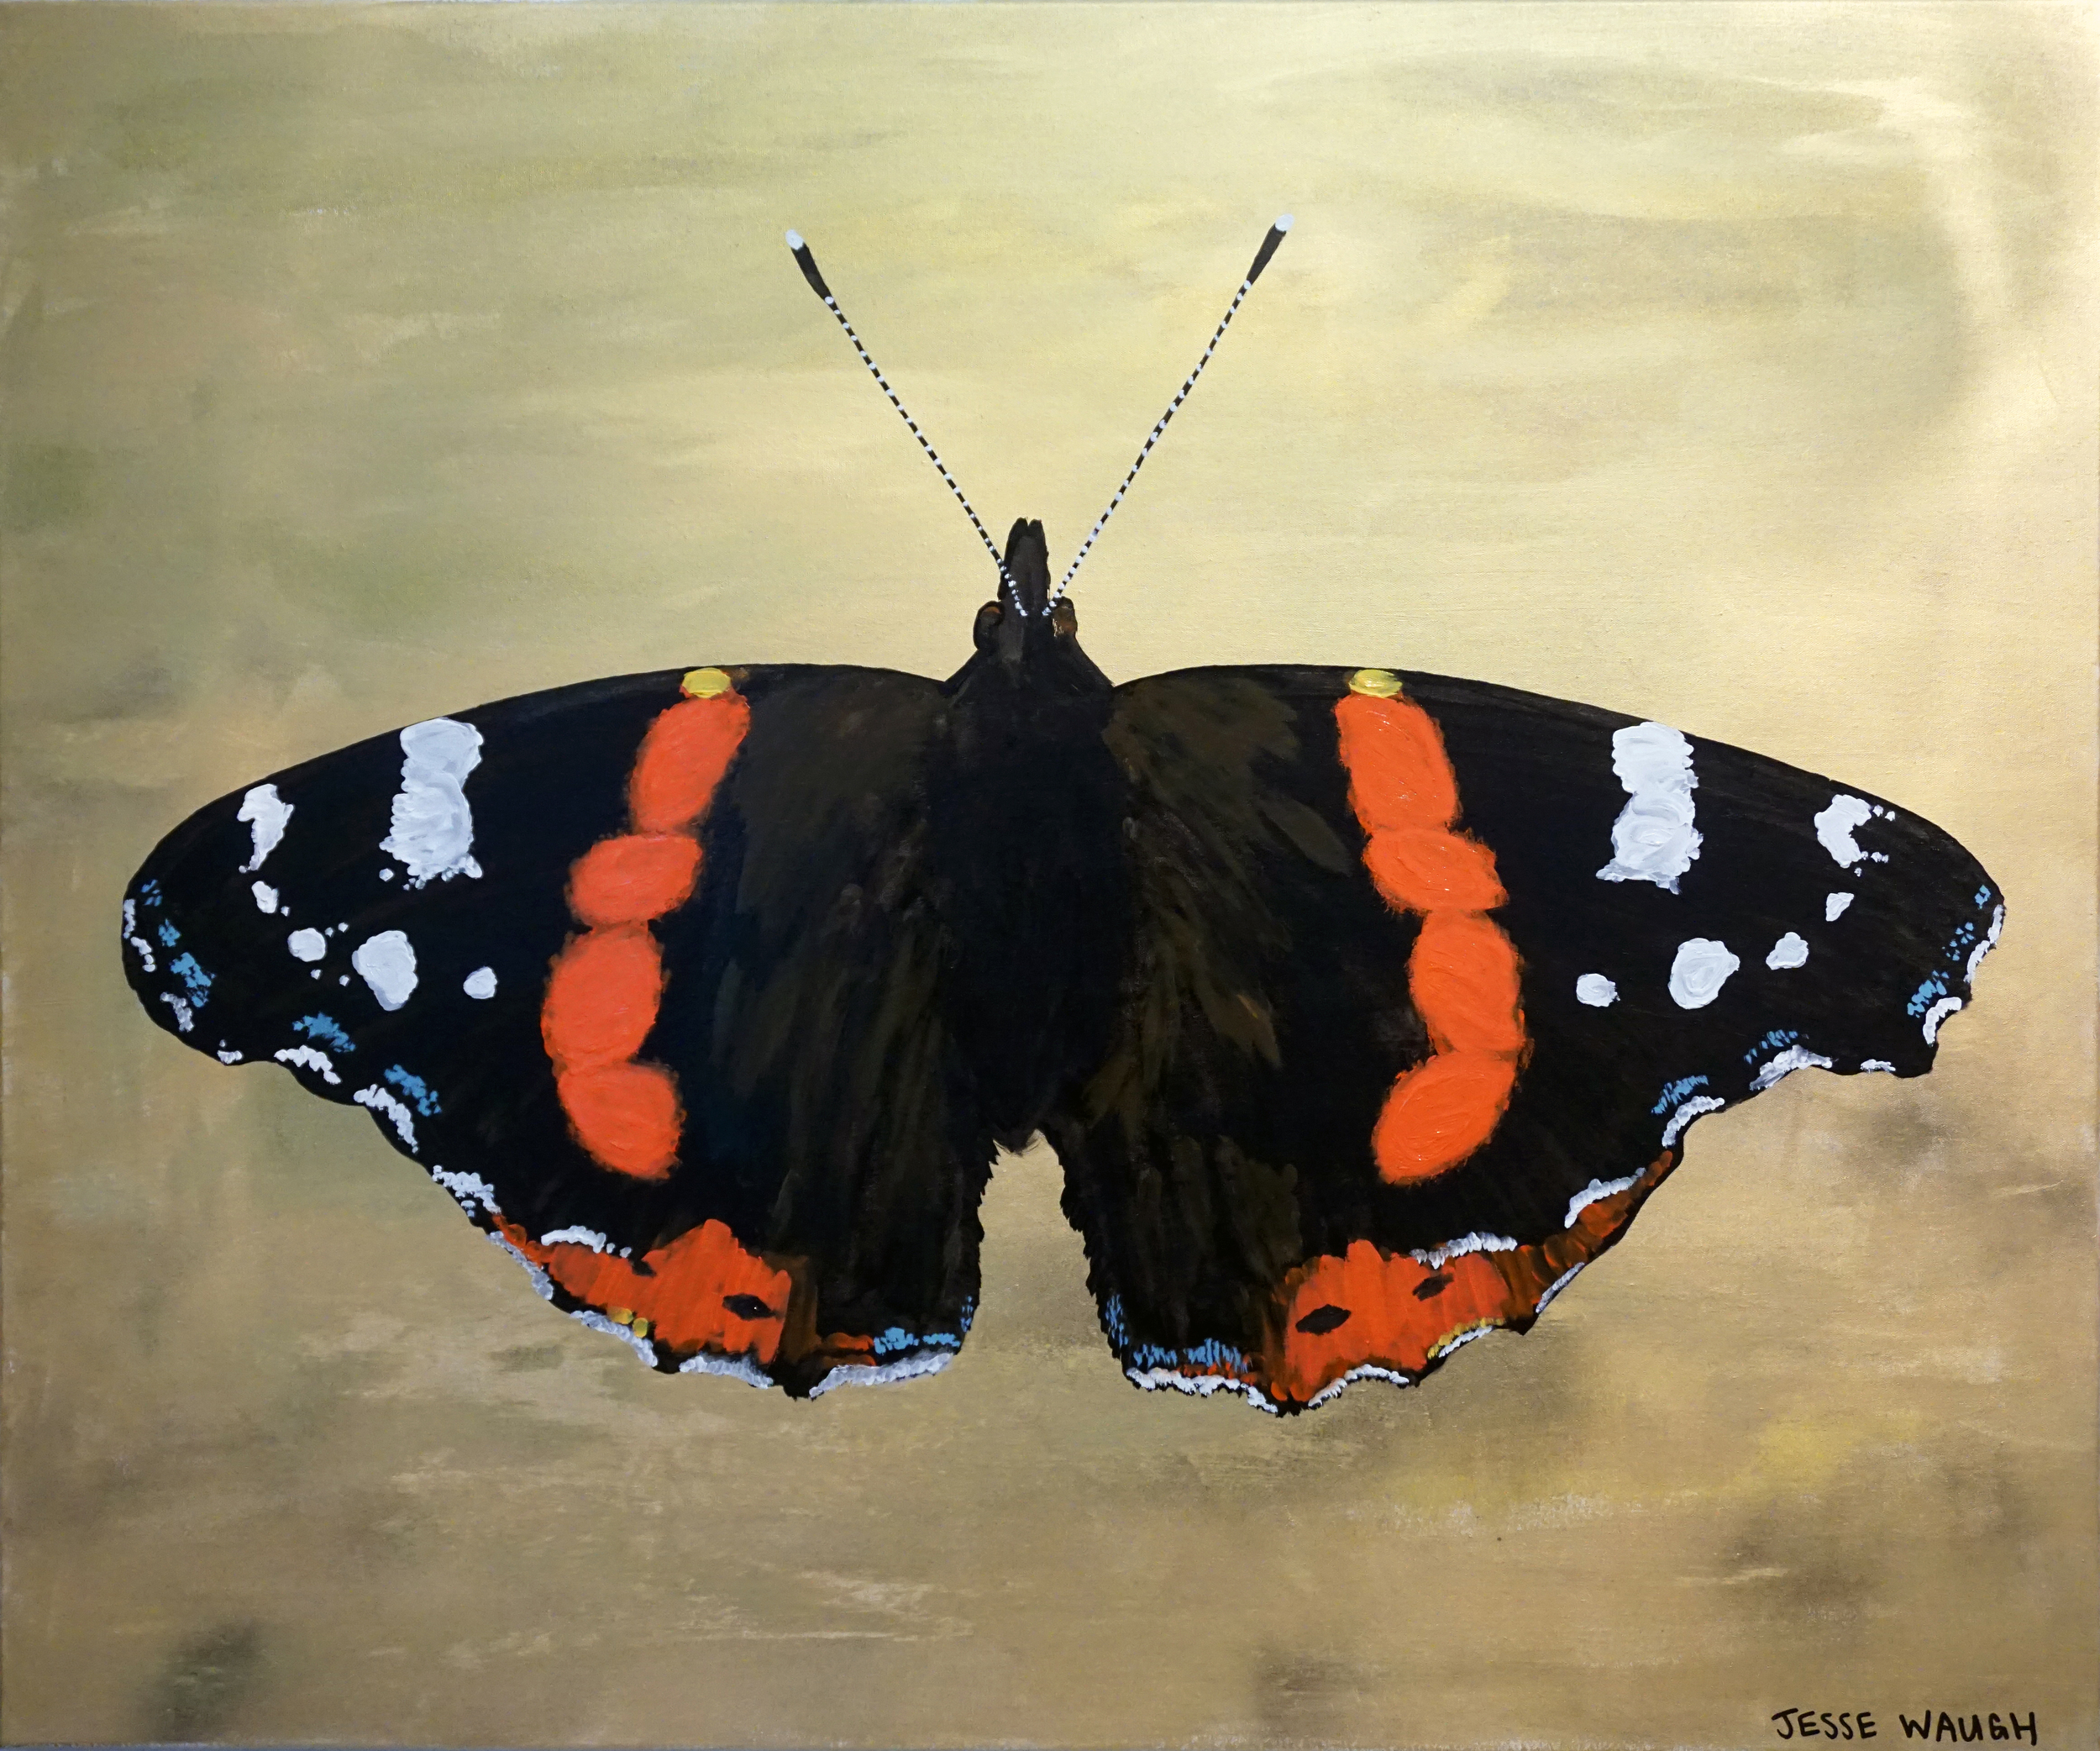 Brighton-Butterfly-Red-Admiral-JESSE-WAUGH-jessewaugh.com.jpg